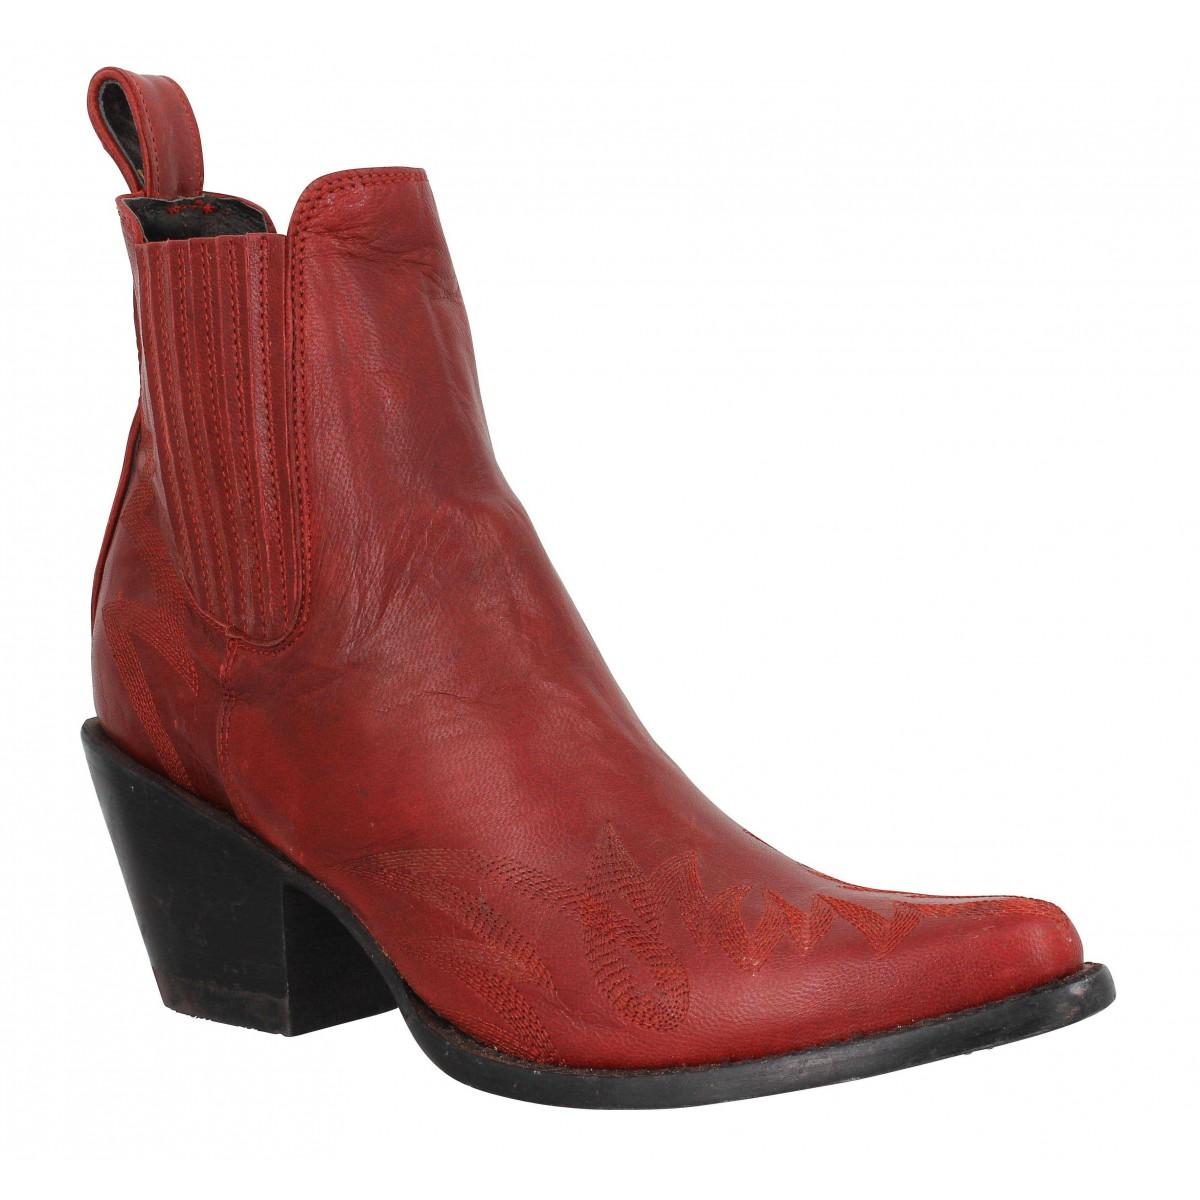 Bottes MEXICANA Gaucho Long Stitch cuir Femme Fire Red